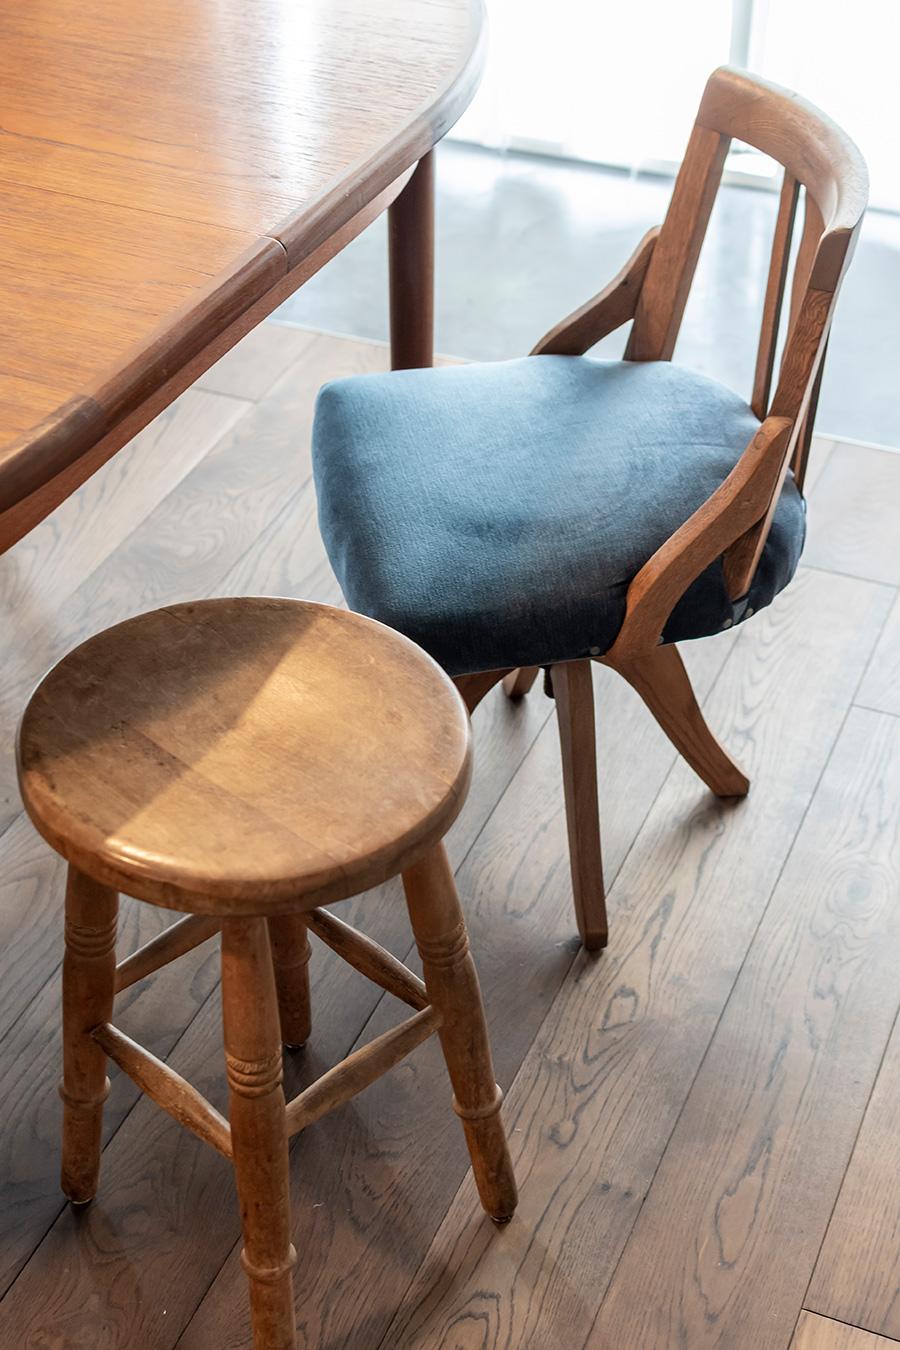 「SAMLWALTZ」のスツール(下)と「kubu」の椅子(上)。